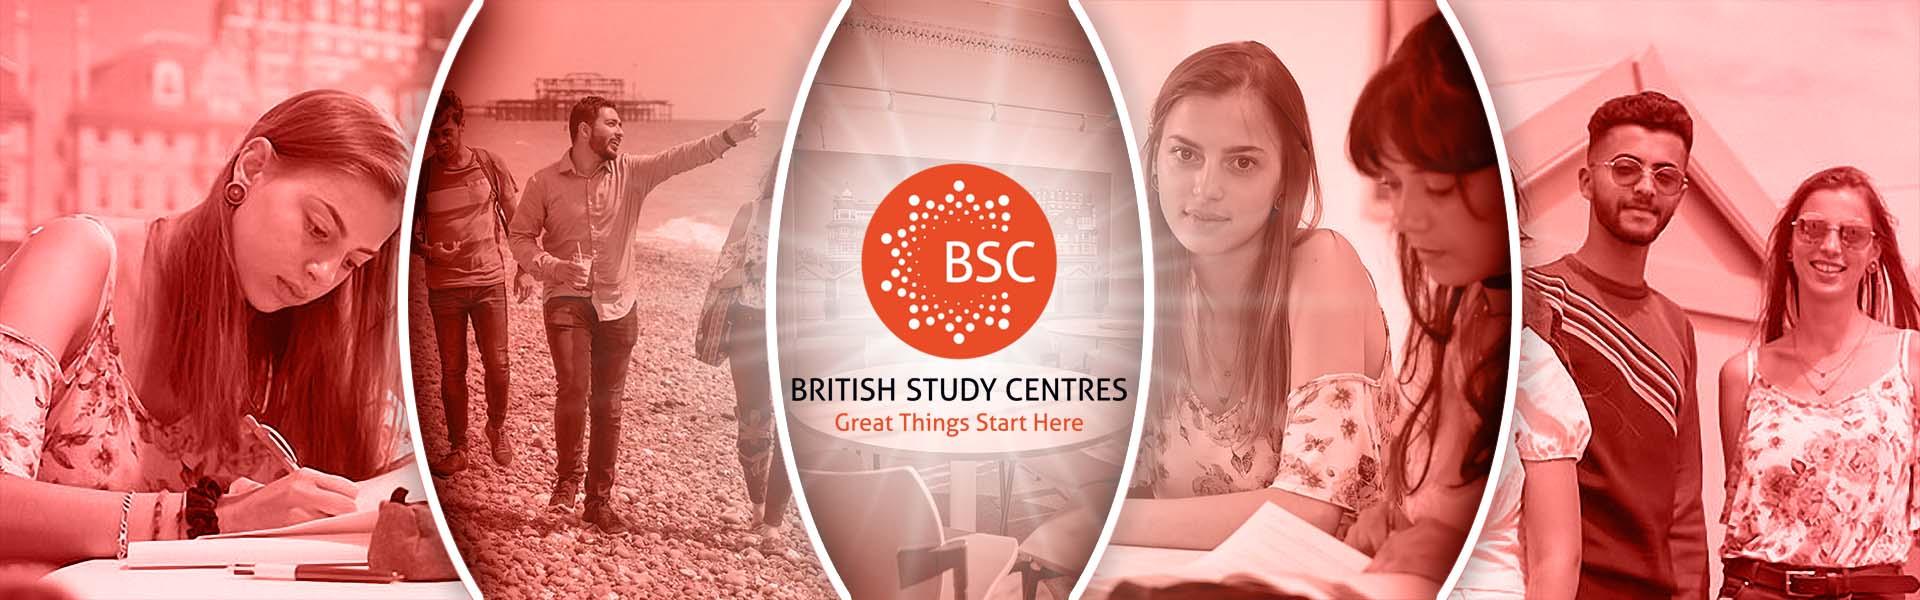 British Study Centres Brighton Dil Okulu